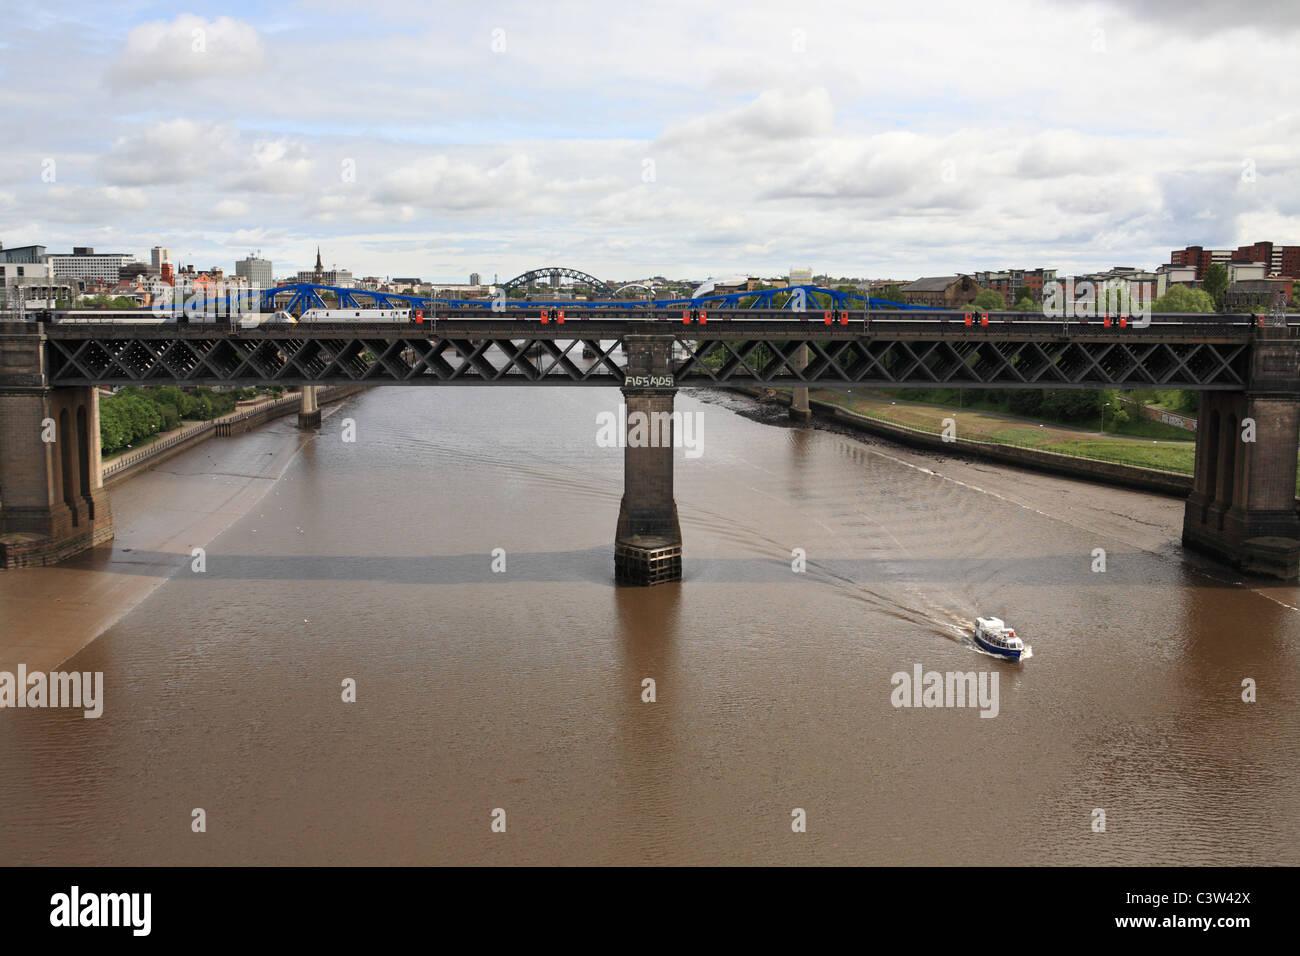 Two East Coast high speed trains pass on the King Edward Bridge between Gateshead and Newcastle, NE England, UK - Stock Image